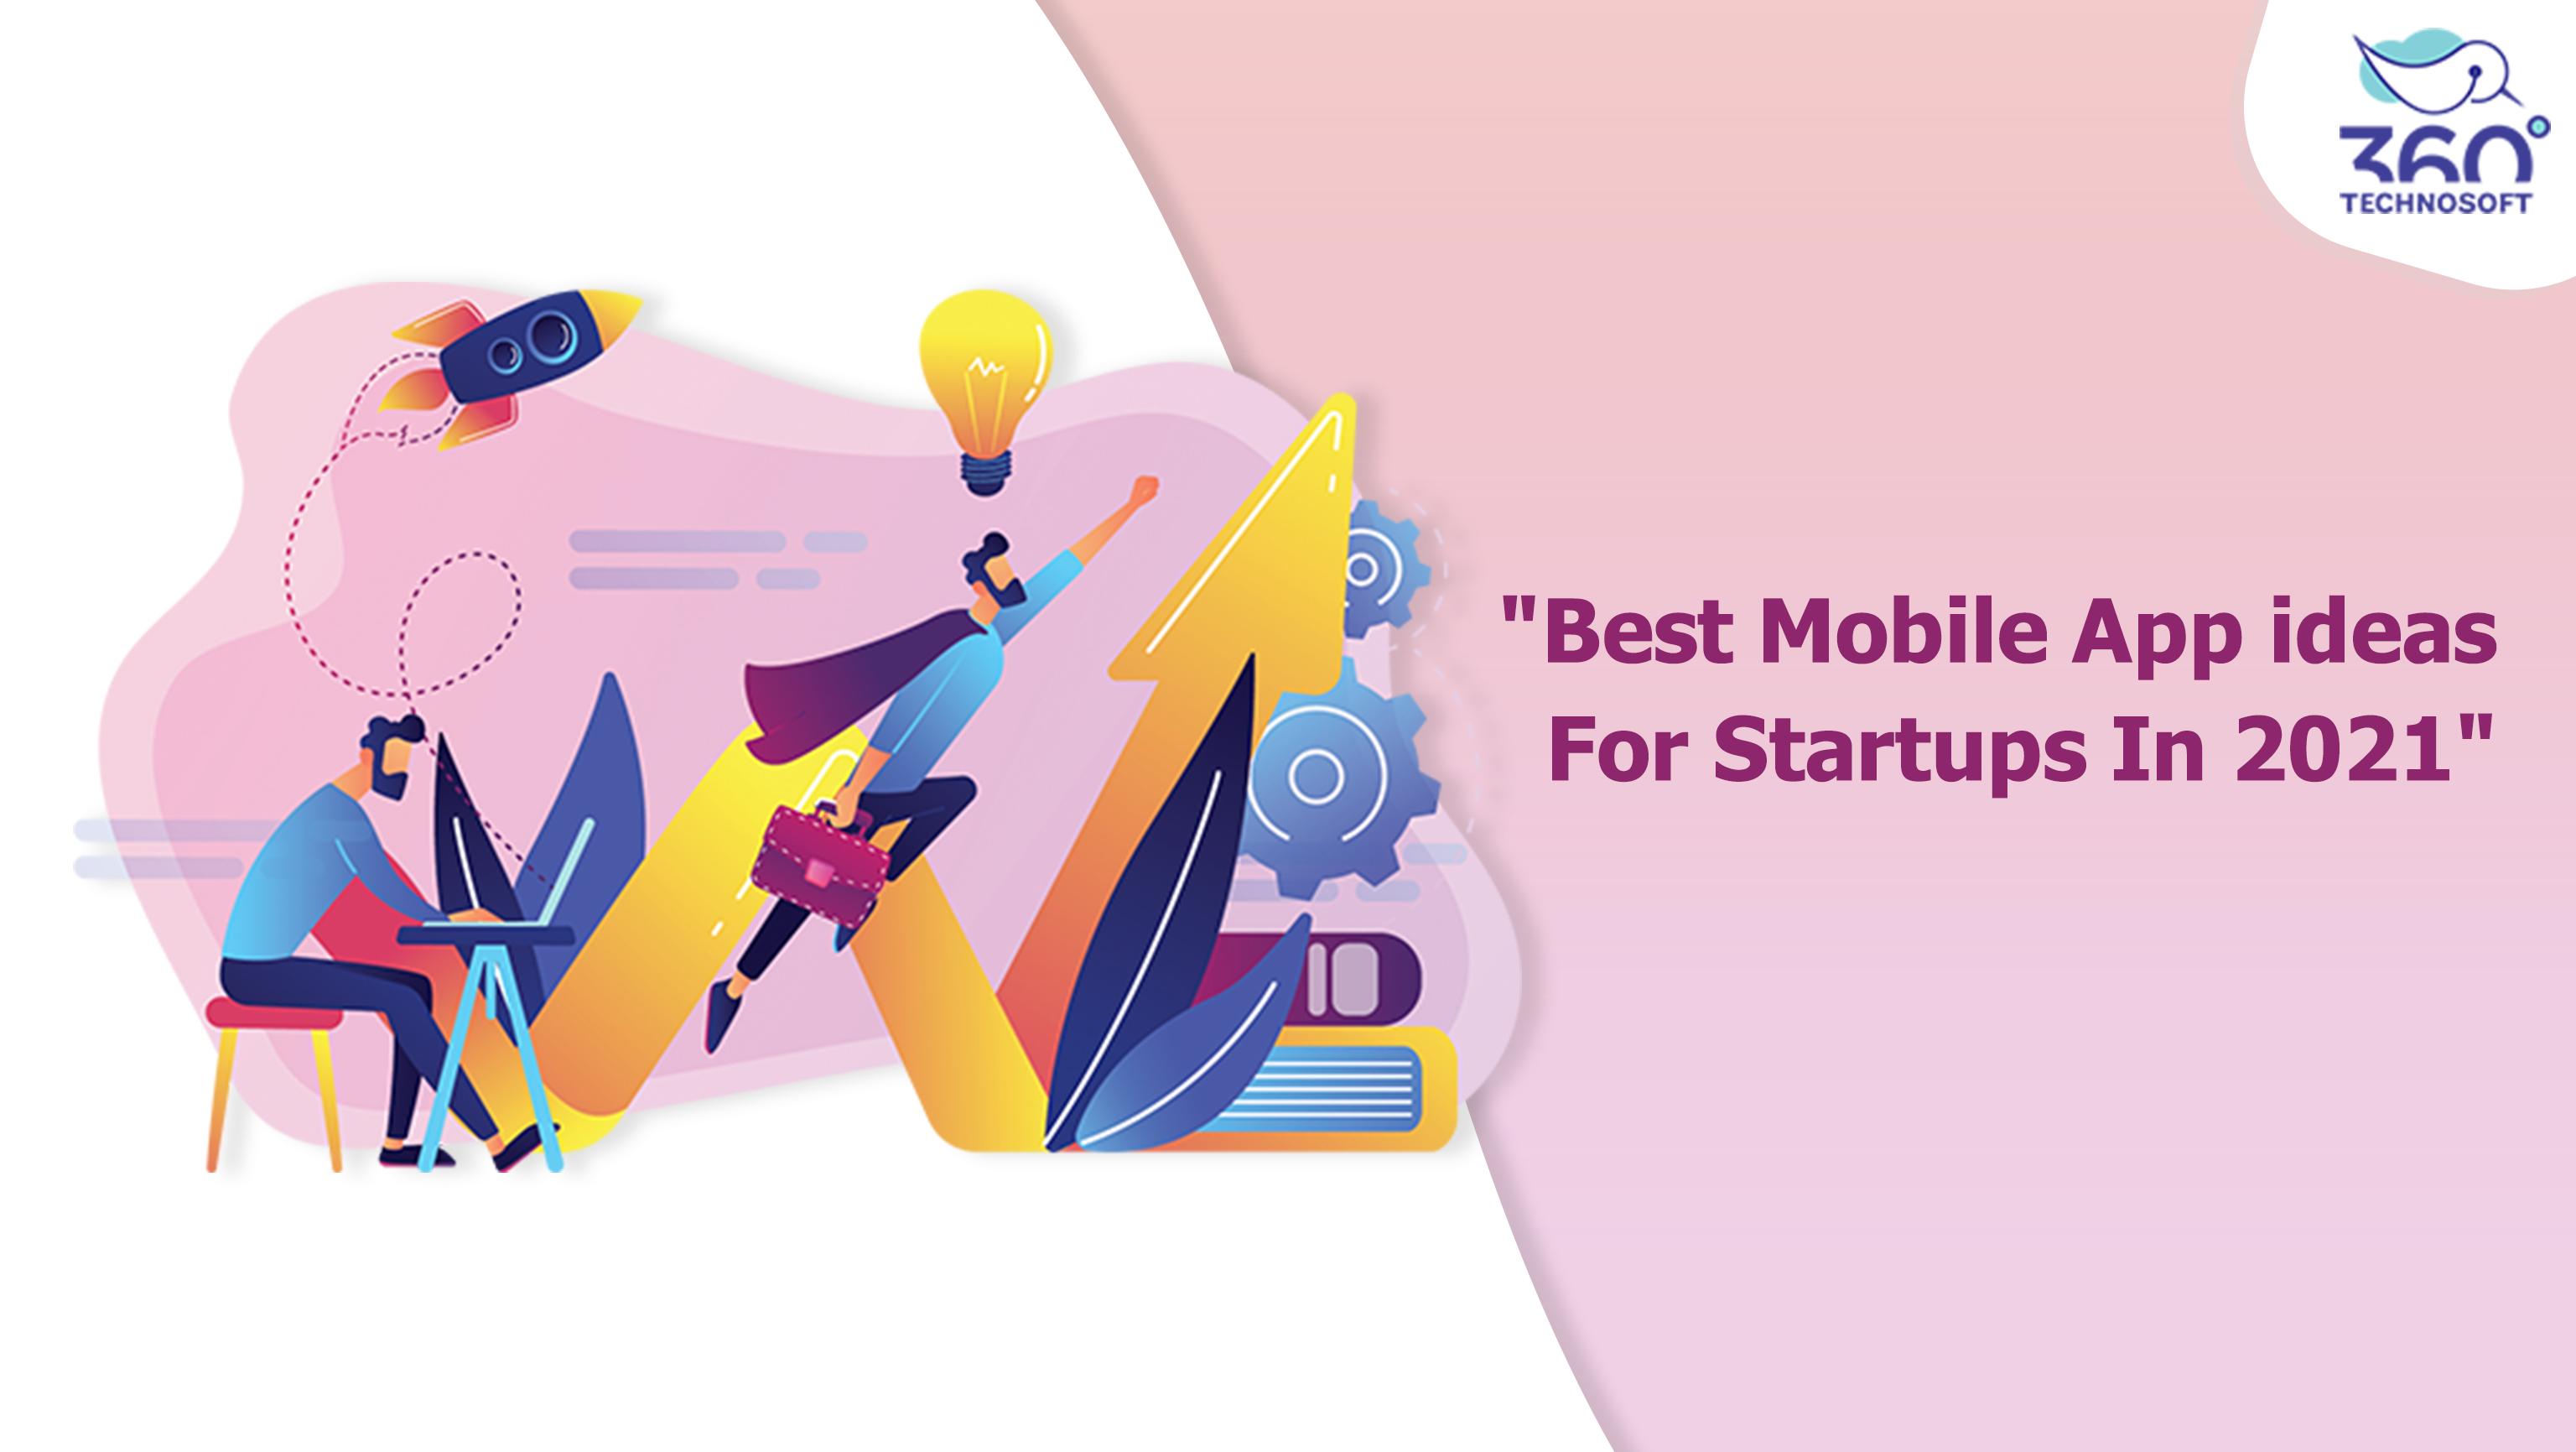 Best Mobile App Ideas For Startups In 2021